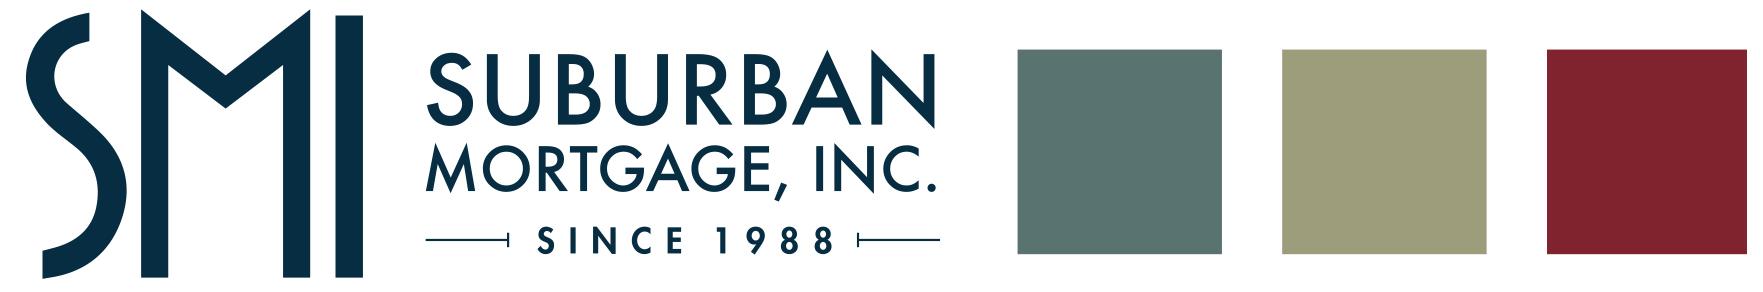 Suburban Mortgage, Inc. - Logo